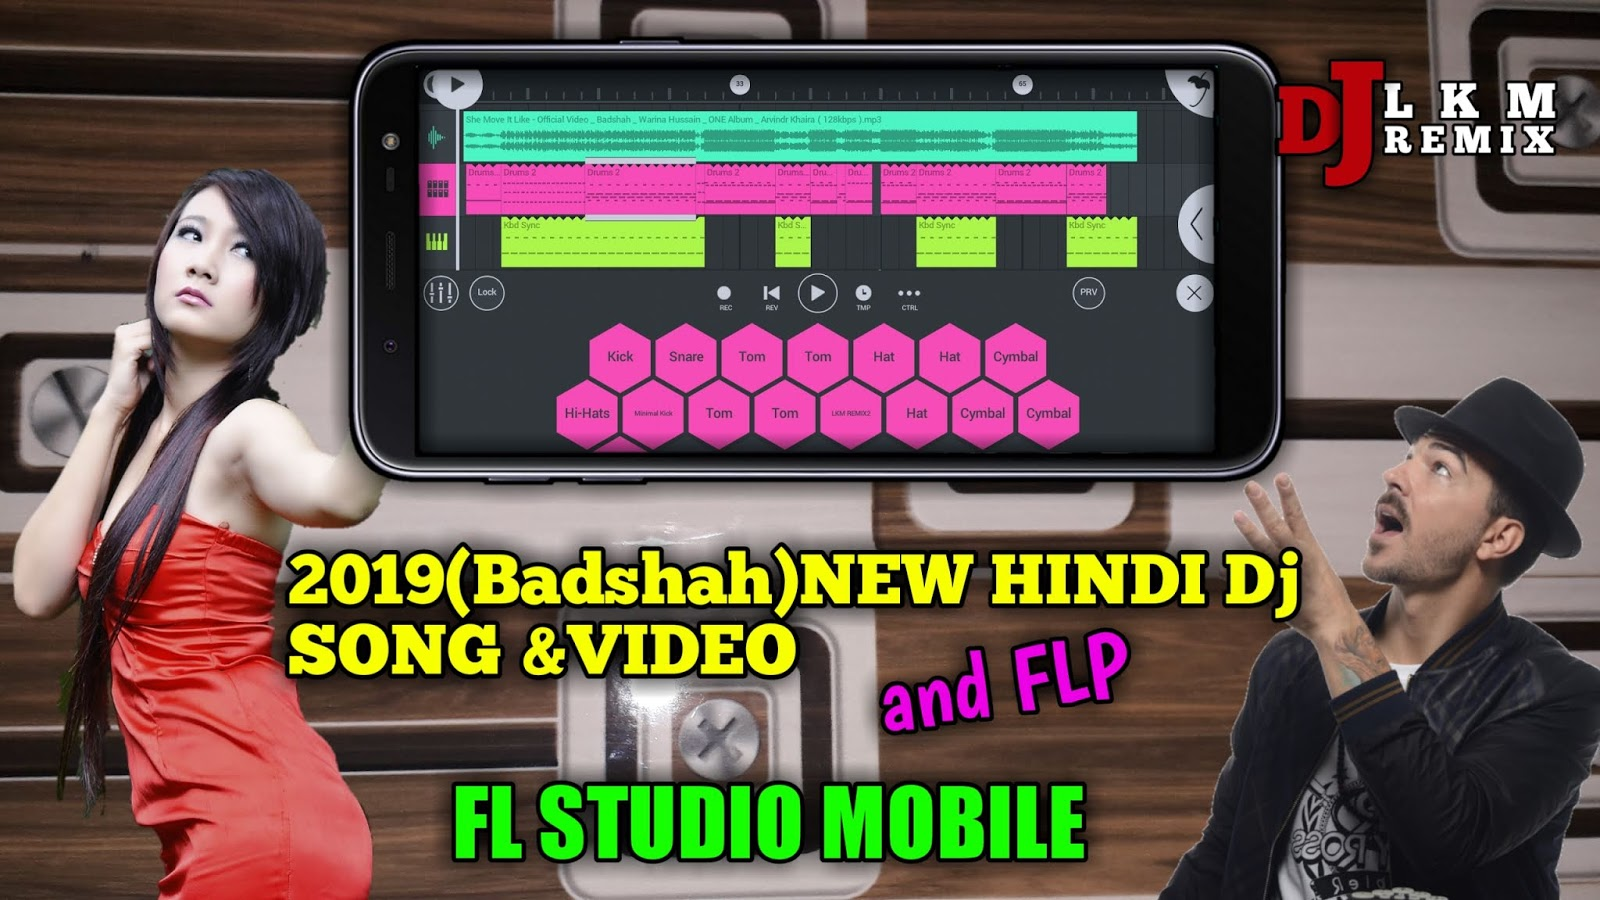 new hindi dj songs free download zip file